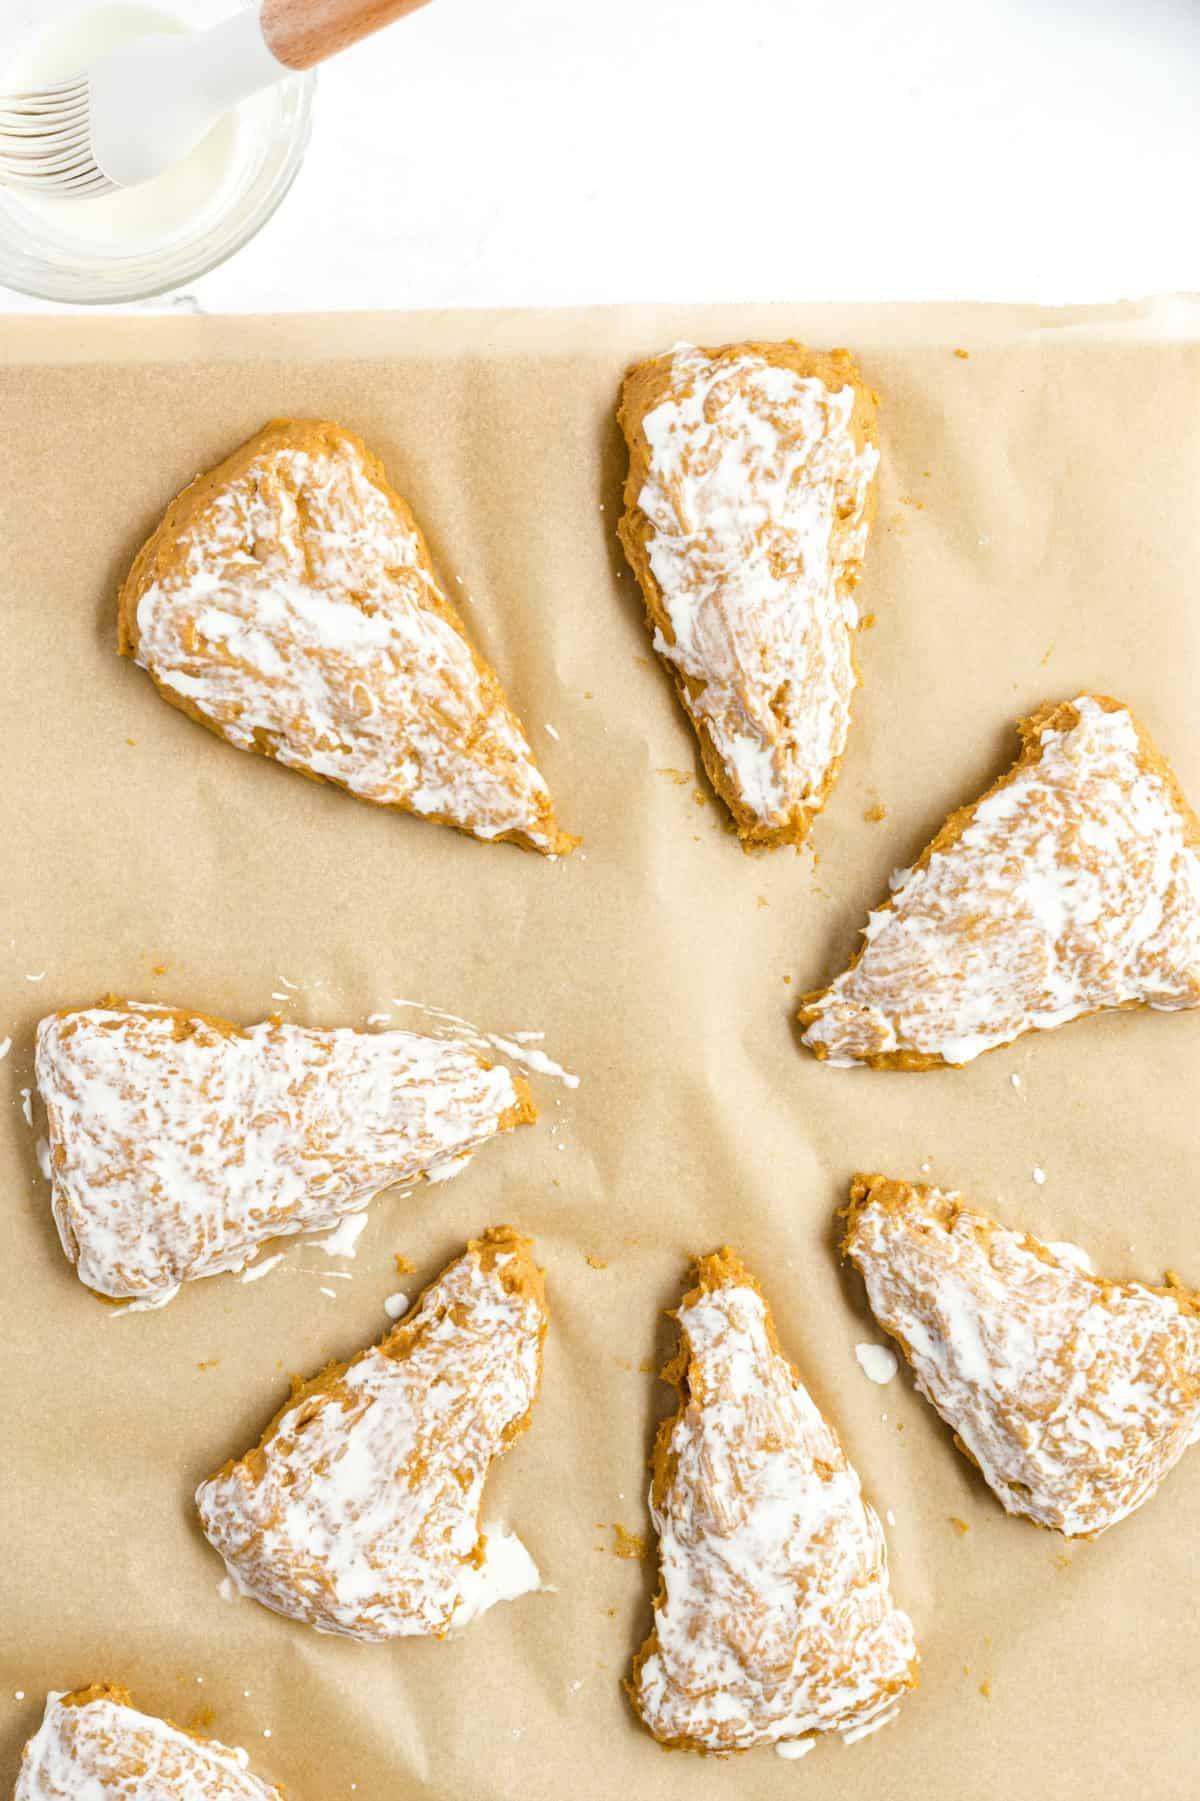 scones brushed with milk